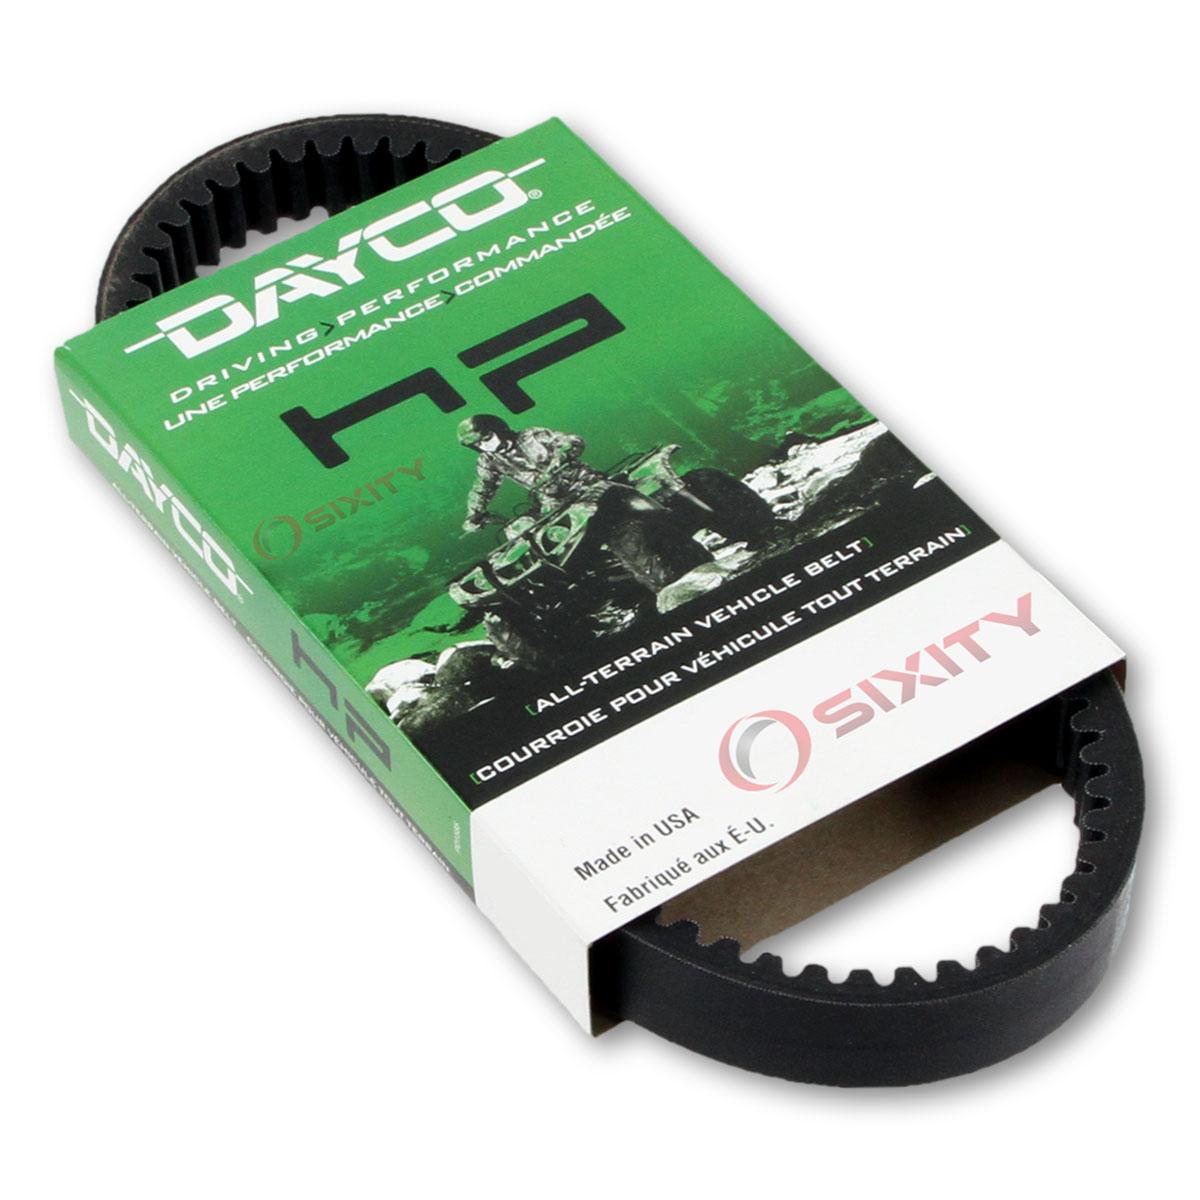 Dayco HP2017 Drive Belt 59011-0003 K5901-10003 Kawasaki OEM Upgrade id